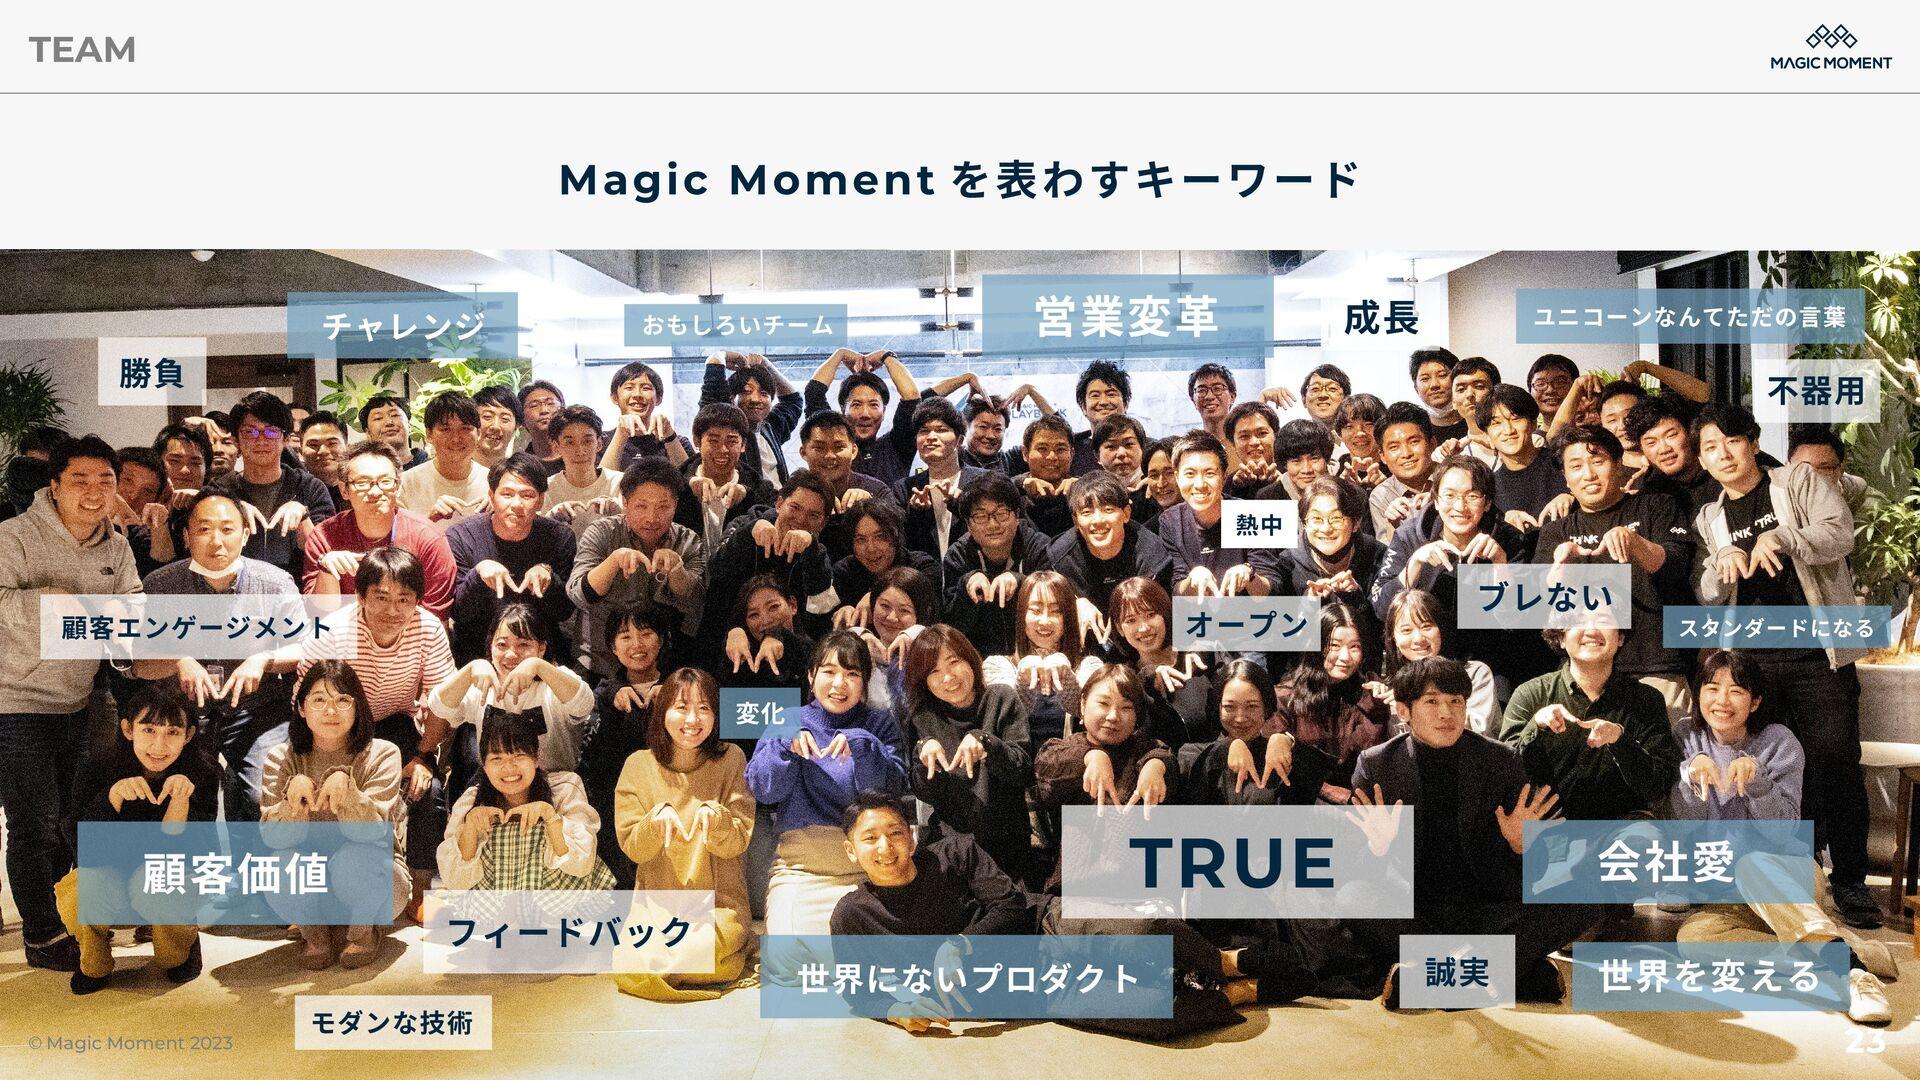 TEAM Magic Moment を表わすキーワード TRUE フィードバック 顧客価値 営...